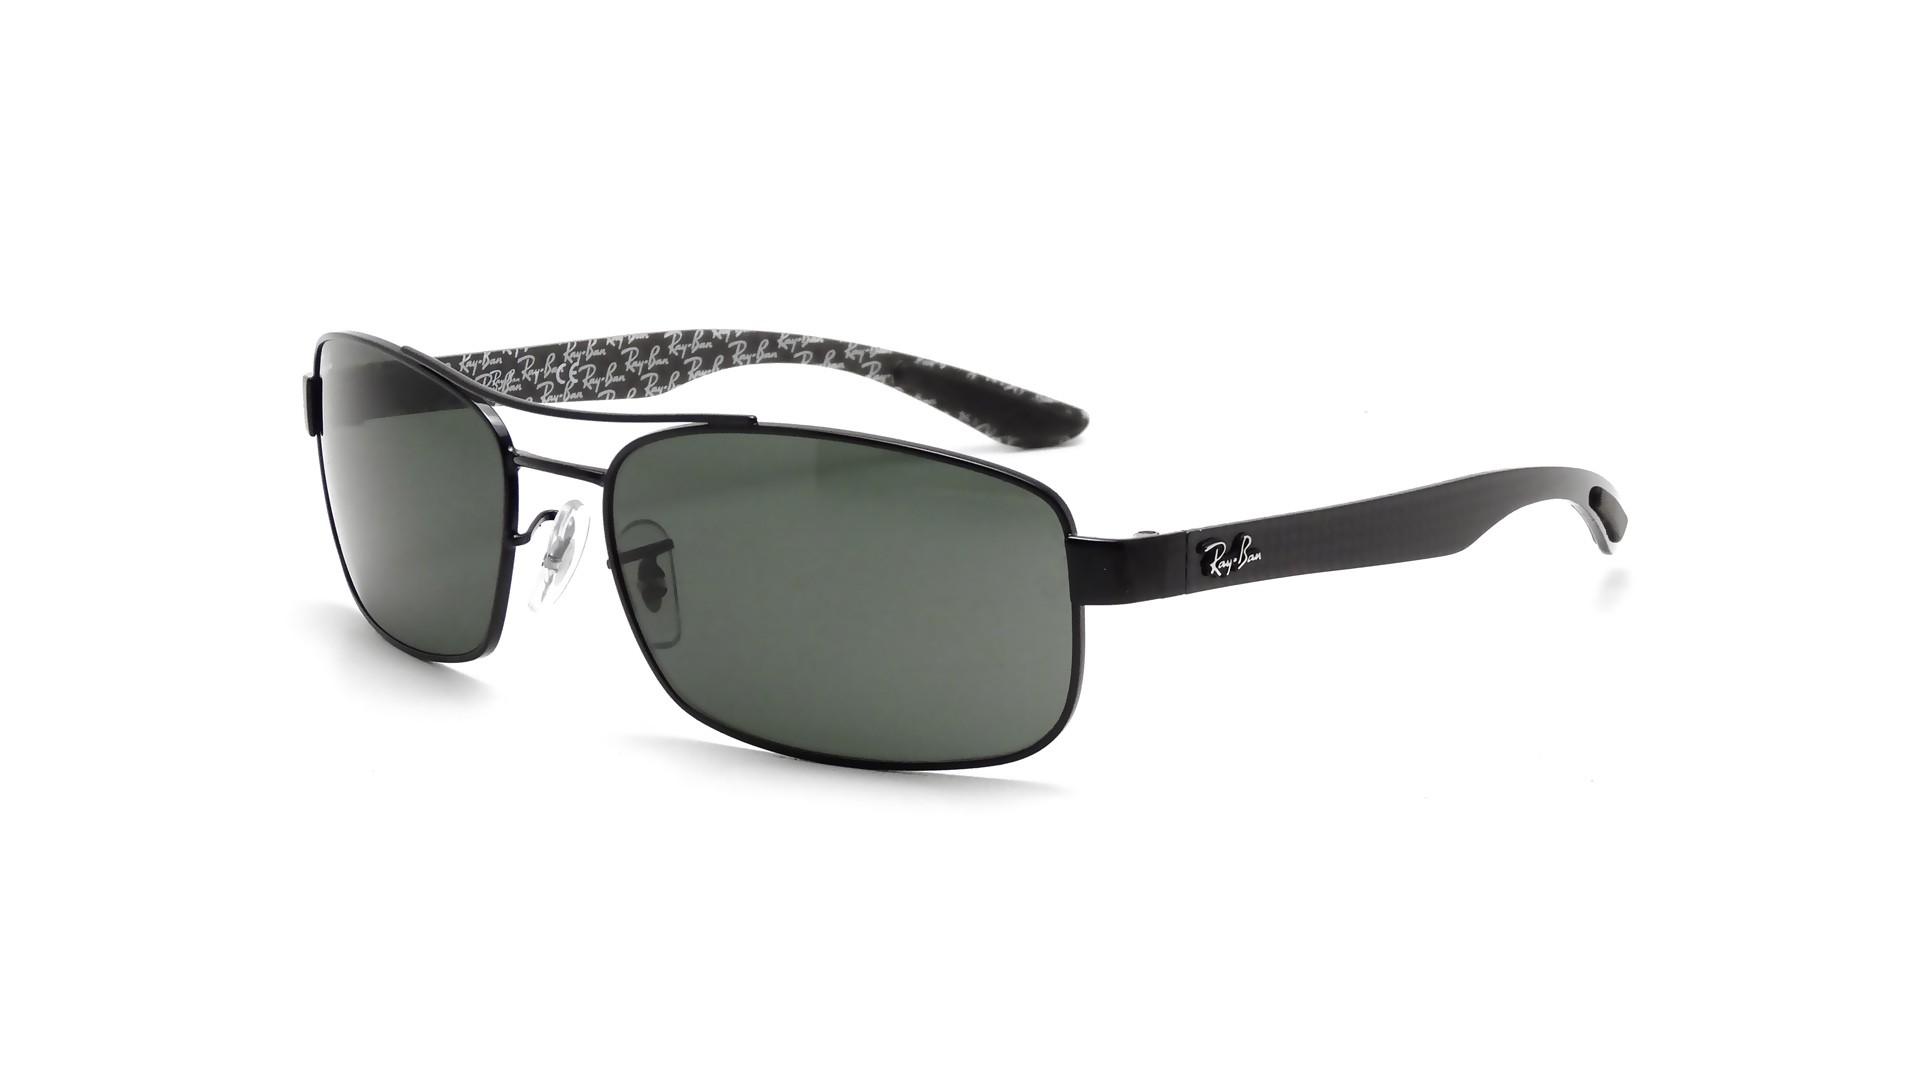 5987232641 Sunglasses Ray-Ban Fibre Carbon Black RB8316 002 62-18 Large